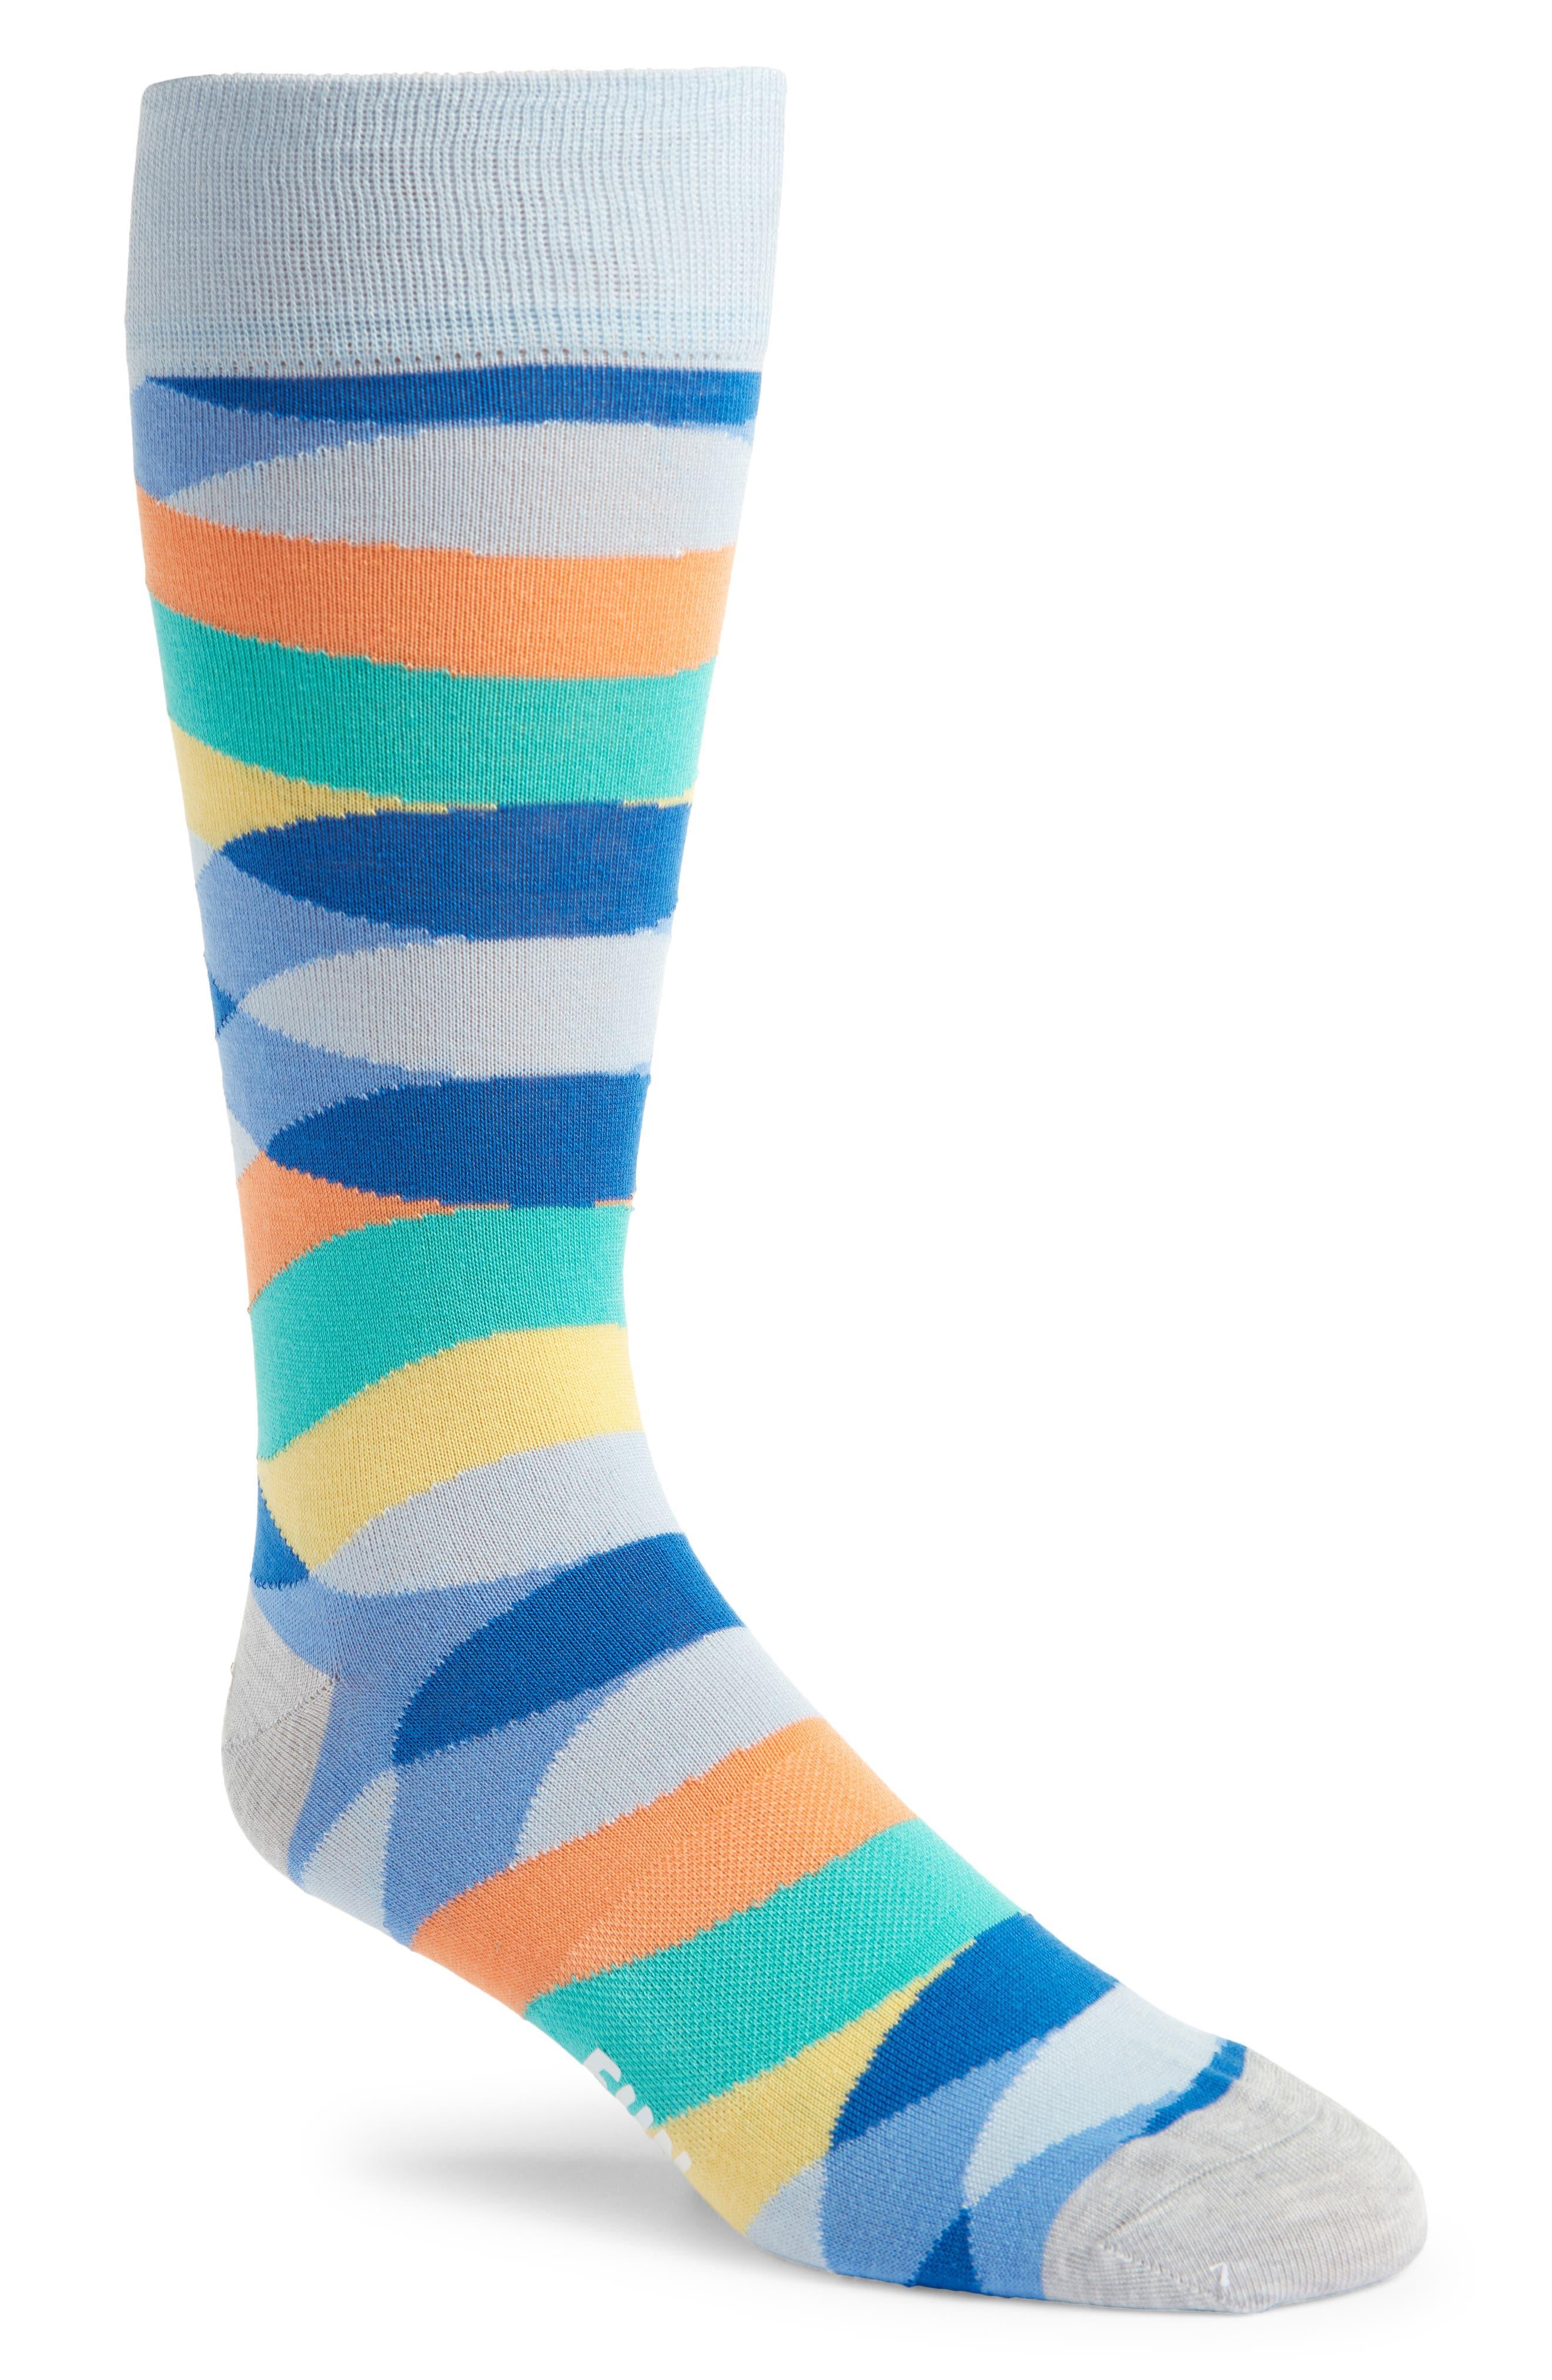 Patterned Tall Socks